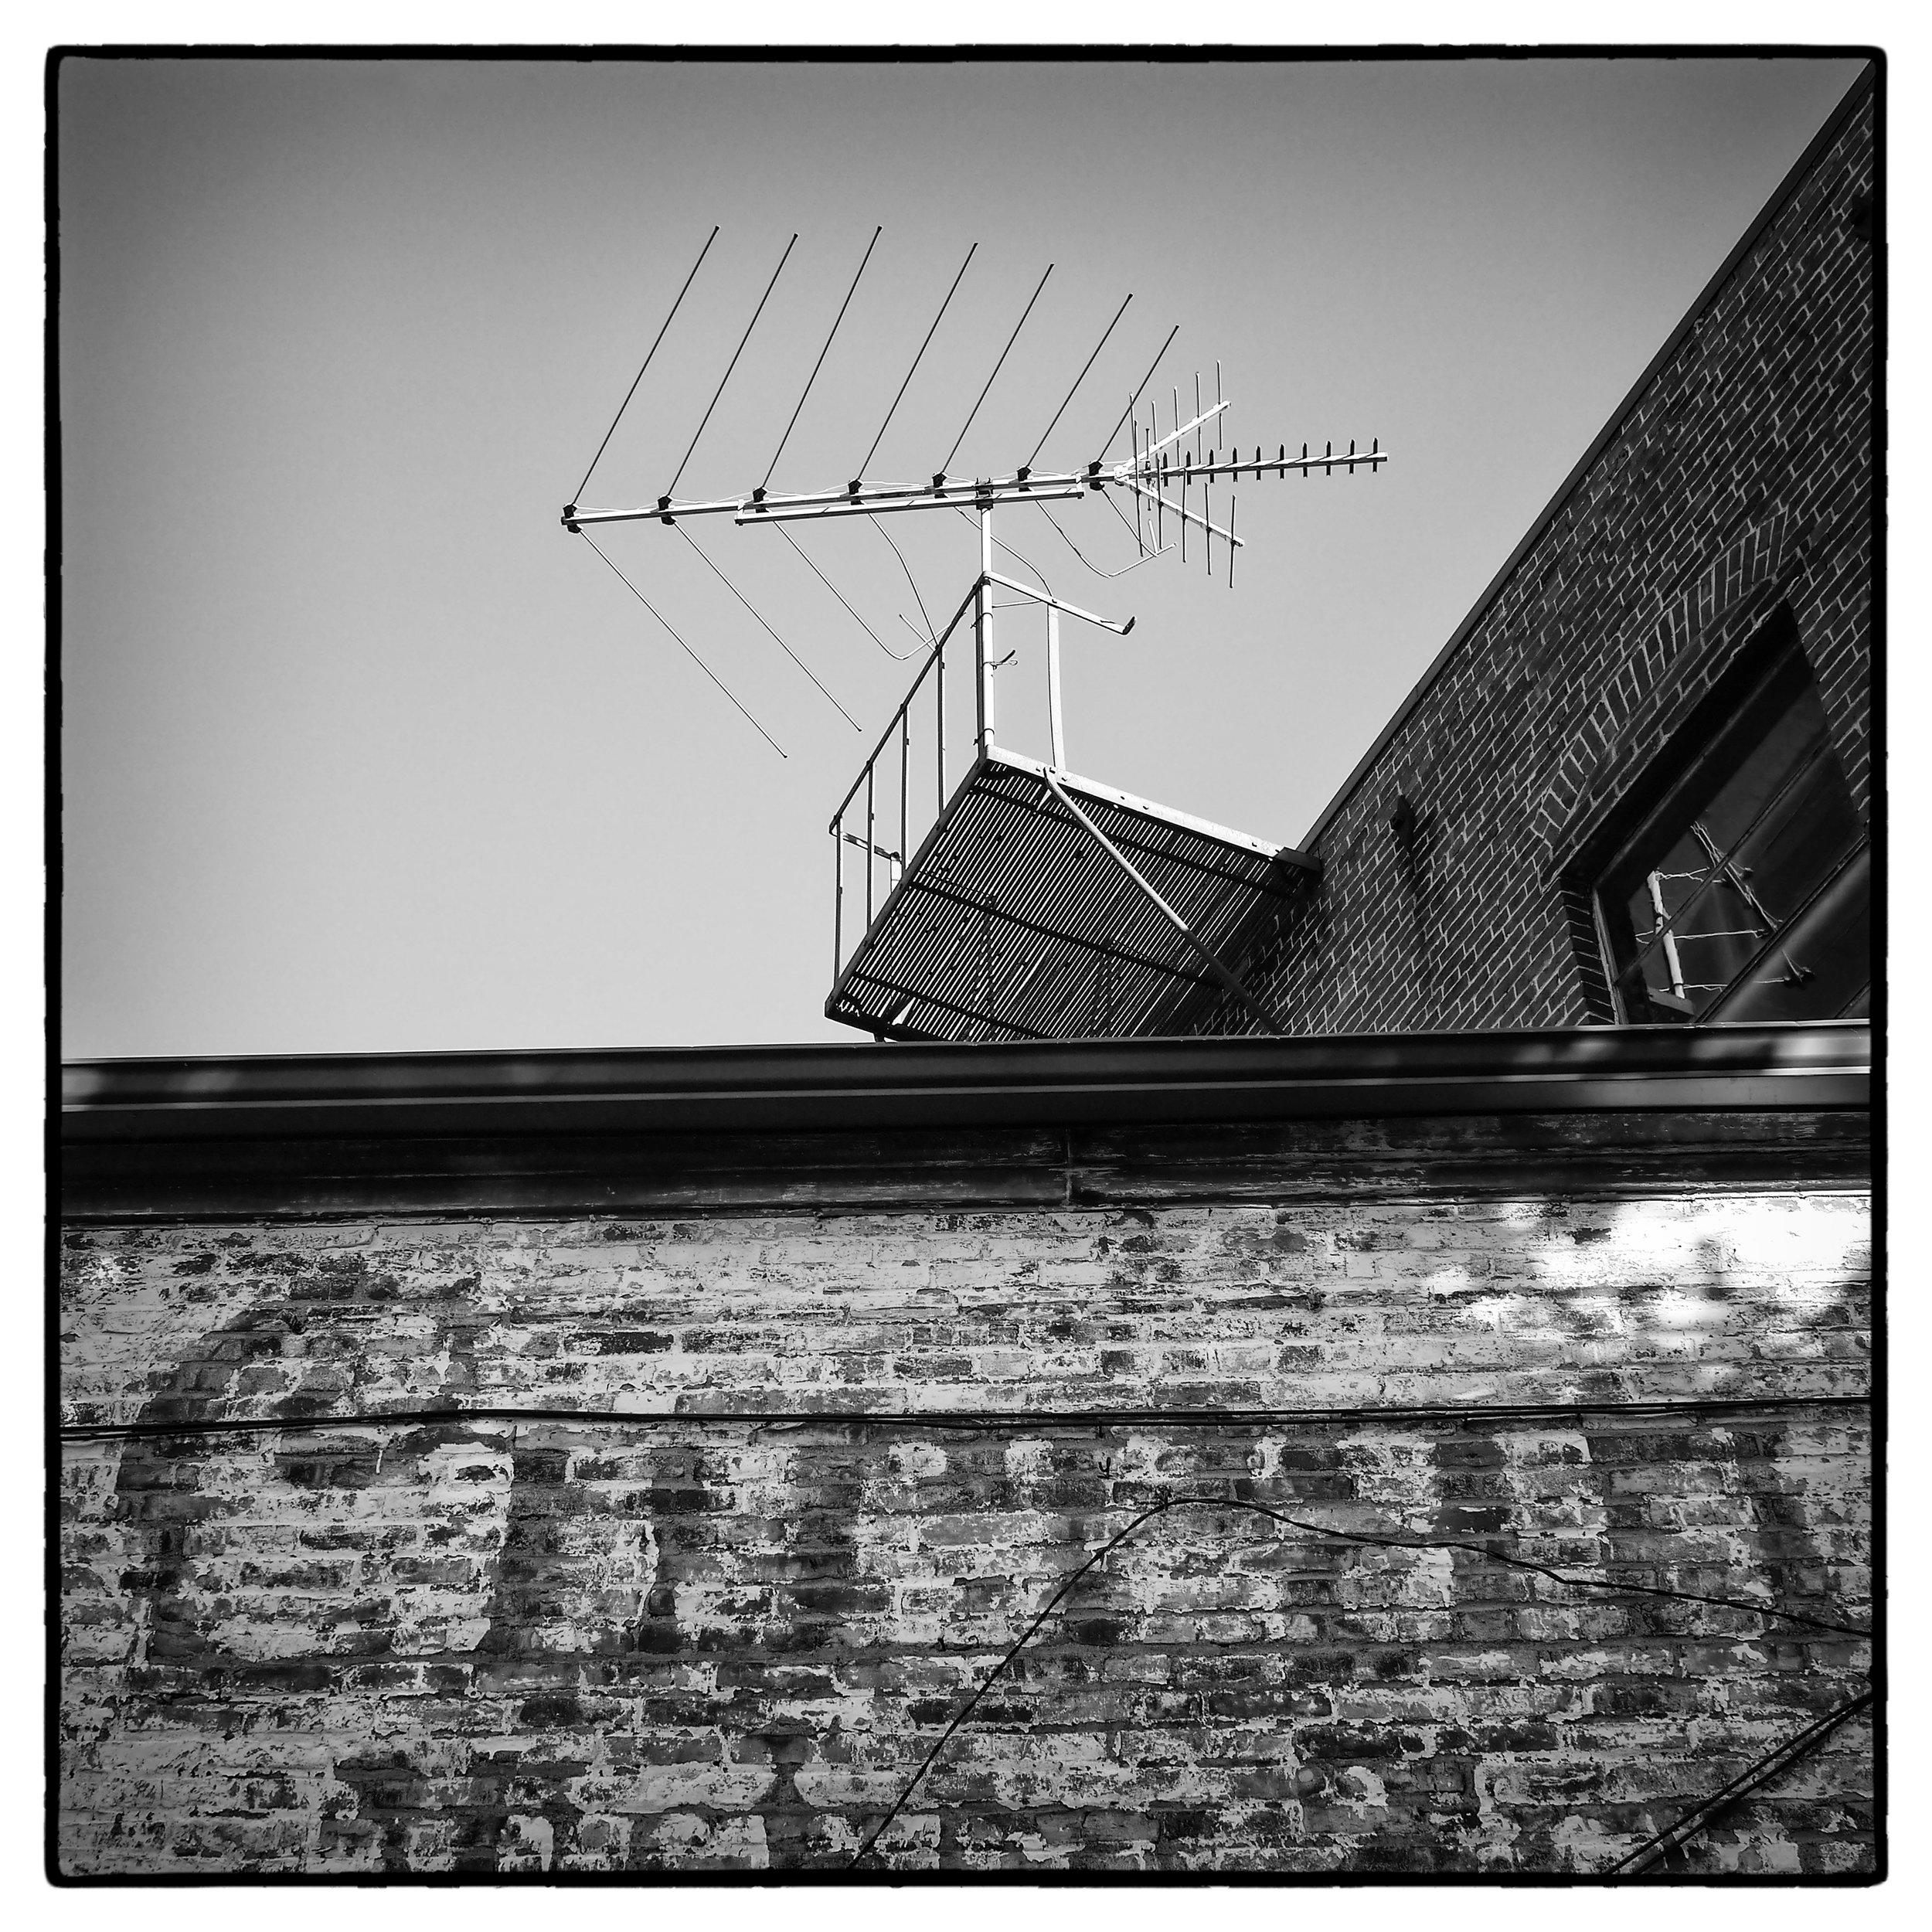 Roof_Top_Antenna_Jackson_St_V2_2016_Jeff_Caplan.jpg